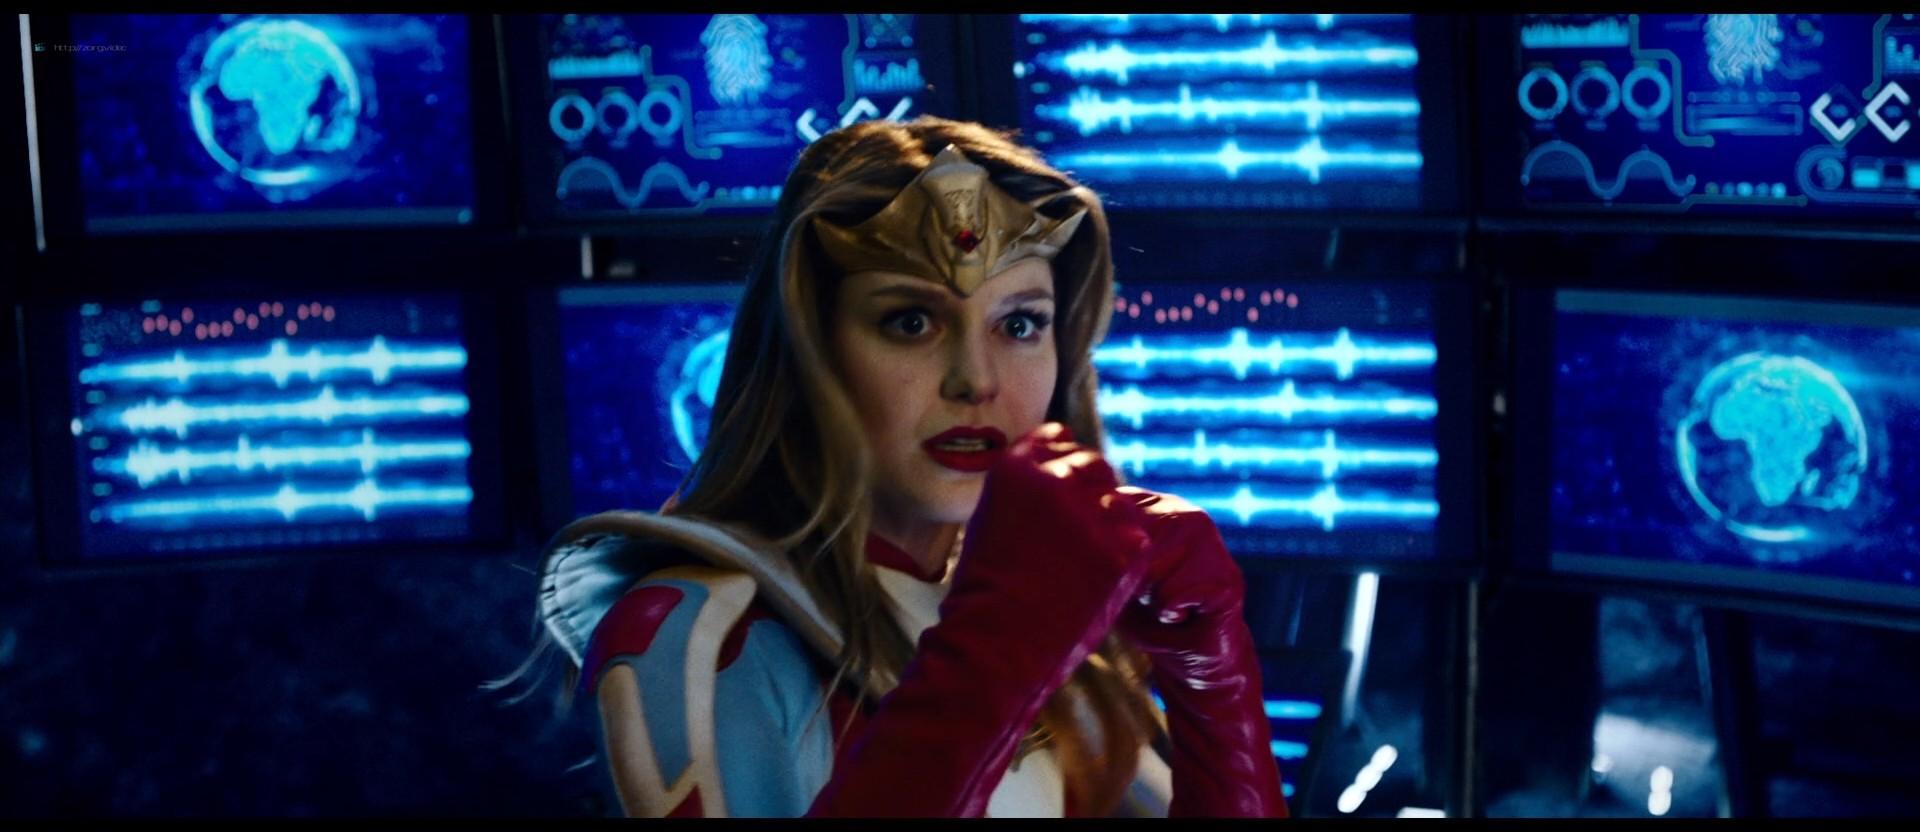 Melissa Benoist hot Shannon Elizabeth sexy - Jay and Silent Bob Reboot (2019) HD 1080p BluRay (2)